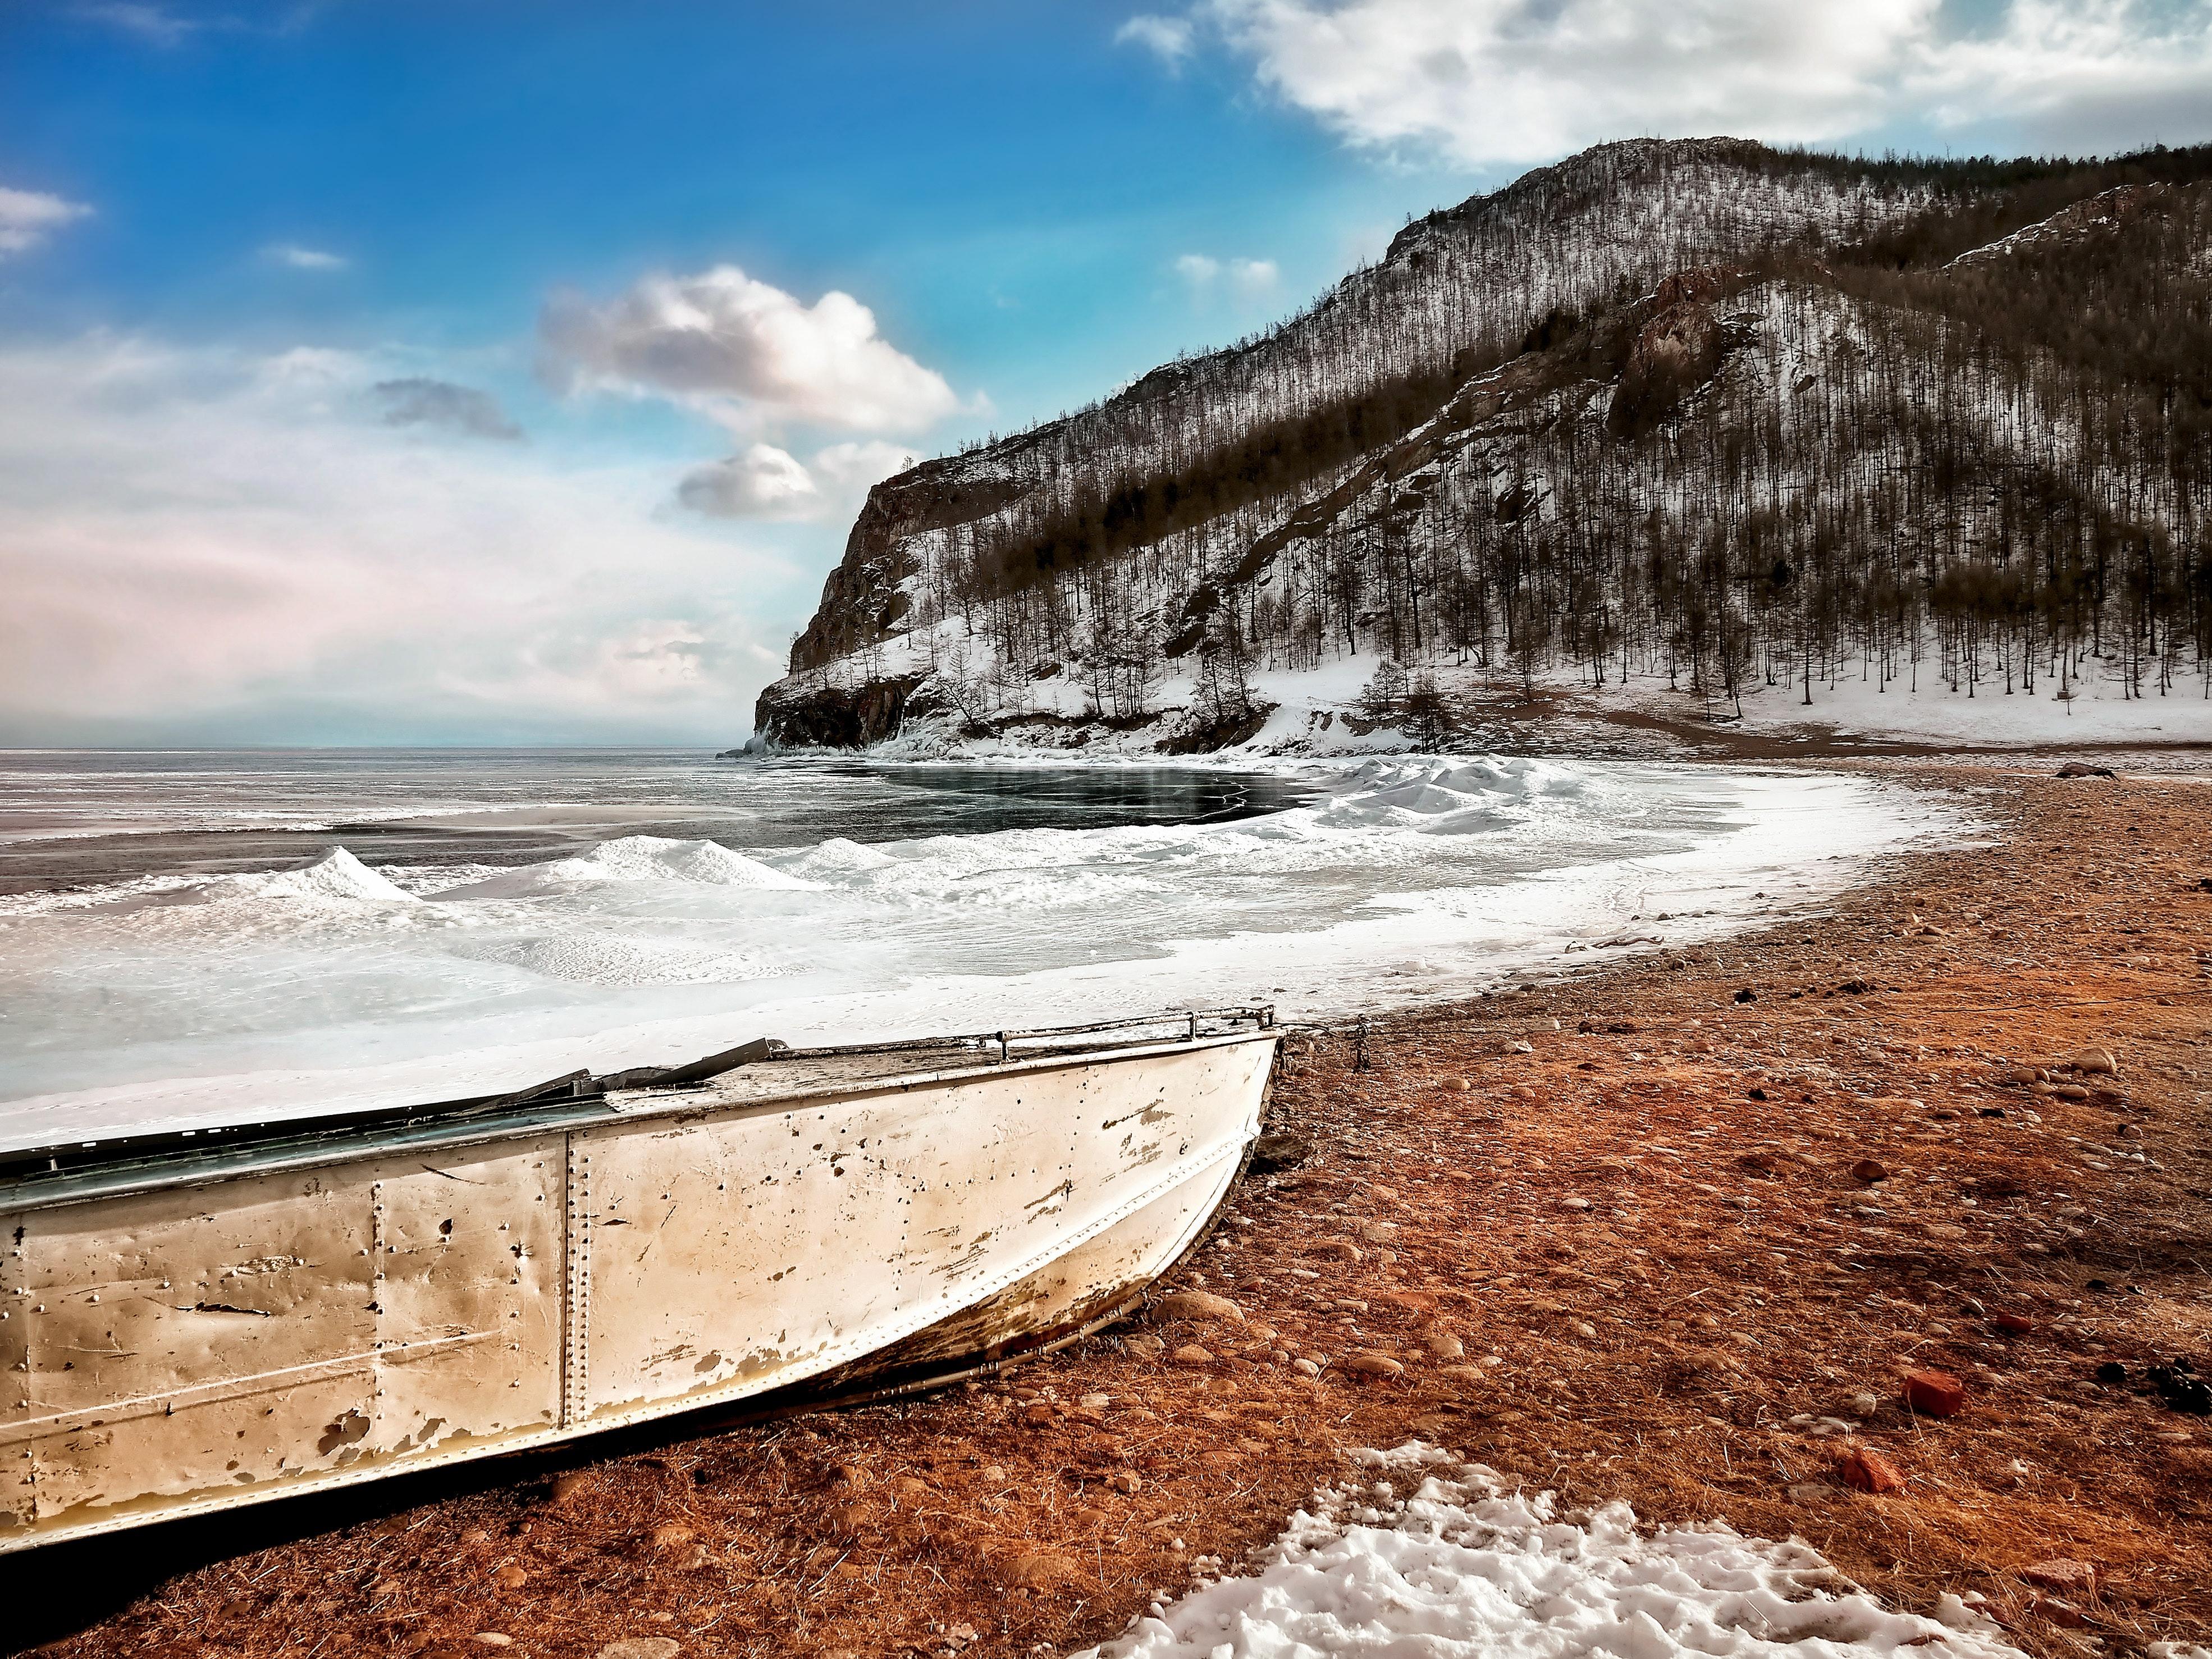 White boat on seashore near mountain under white and blue sky photo